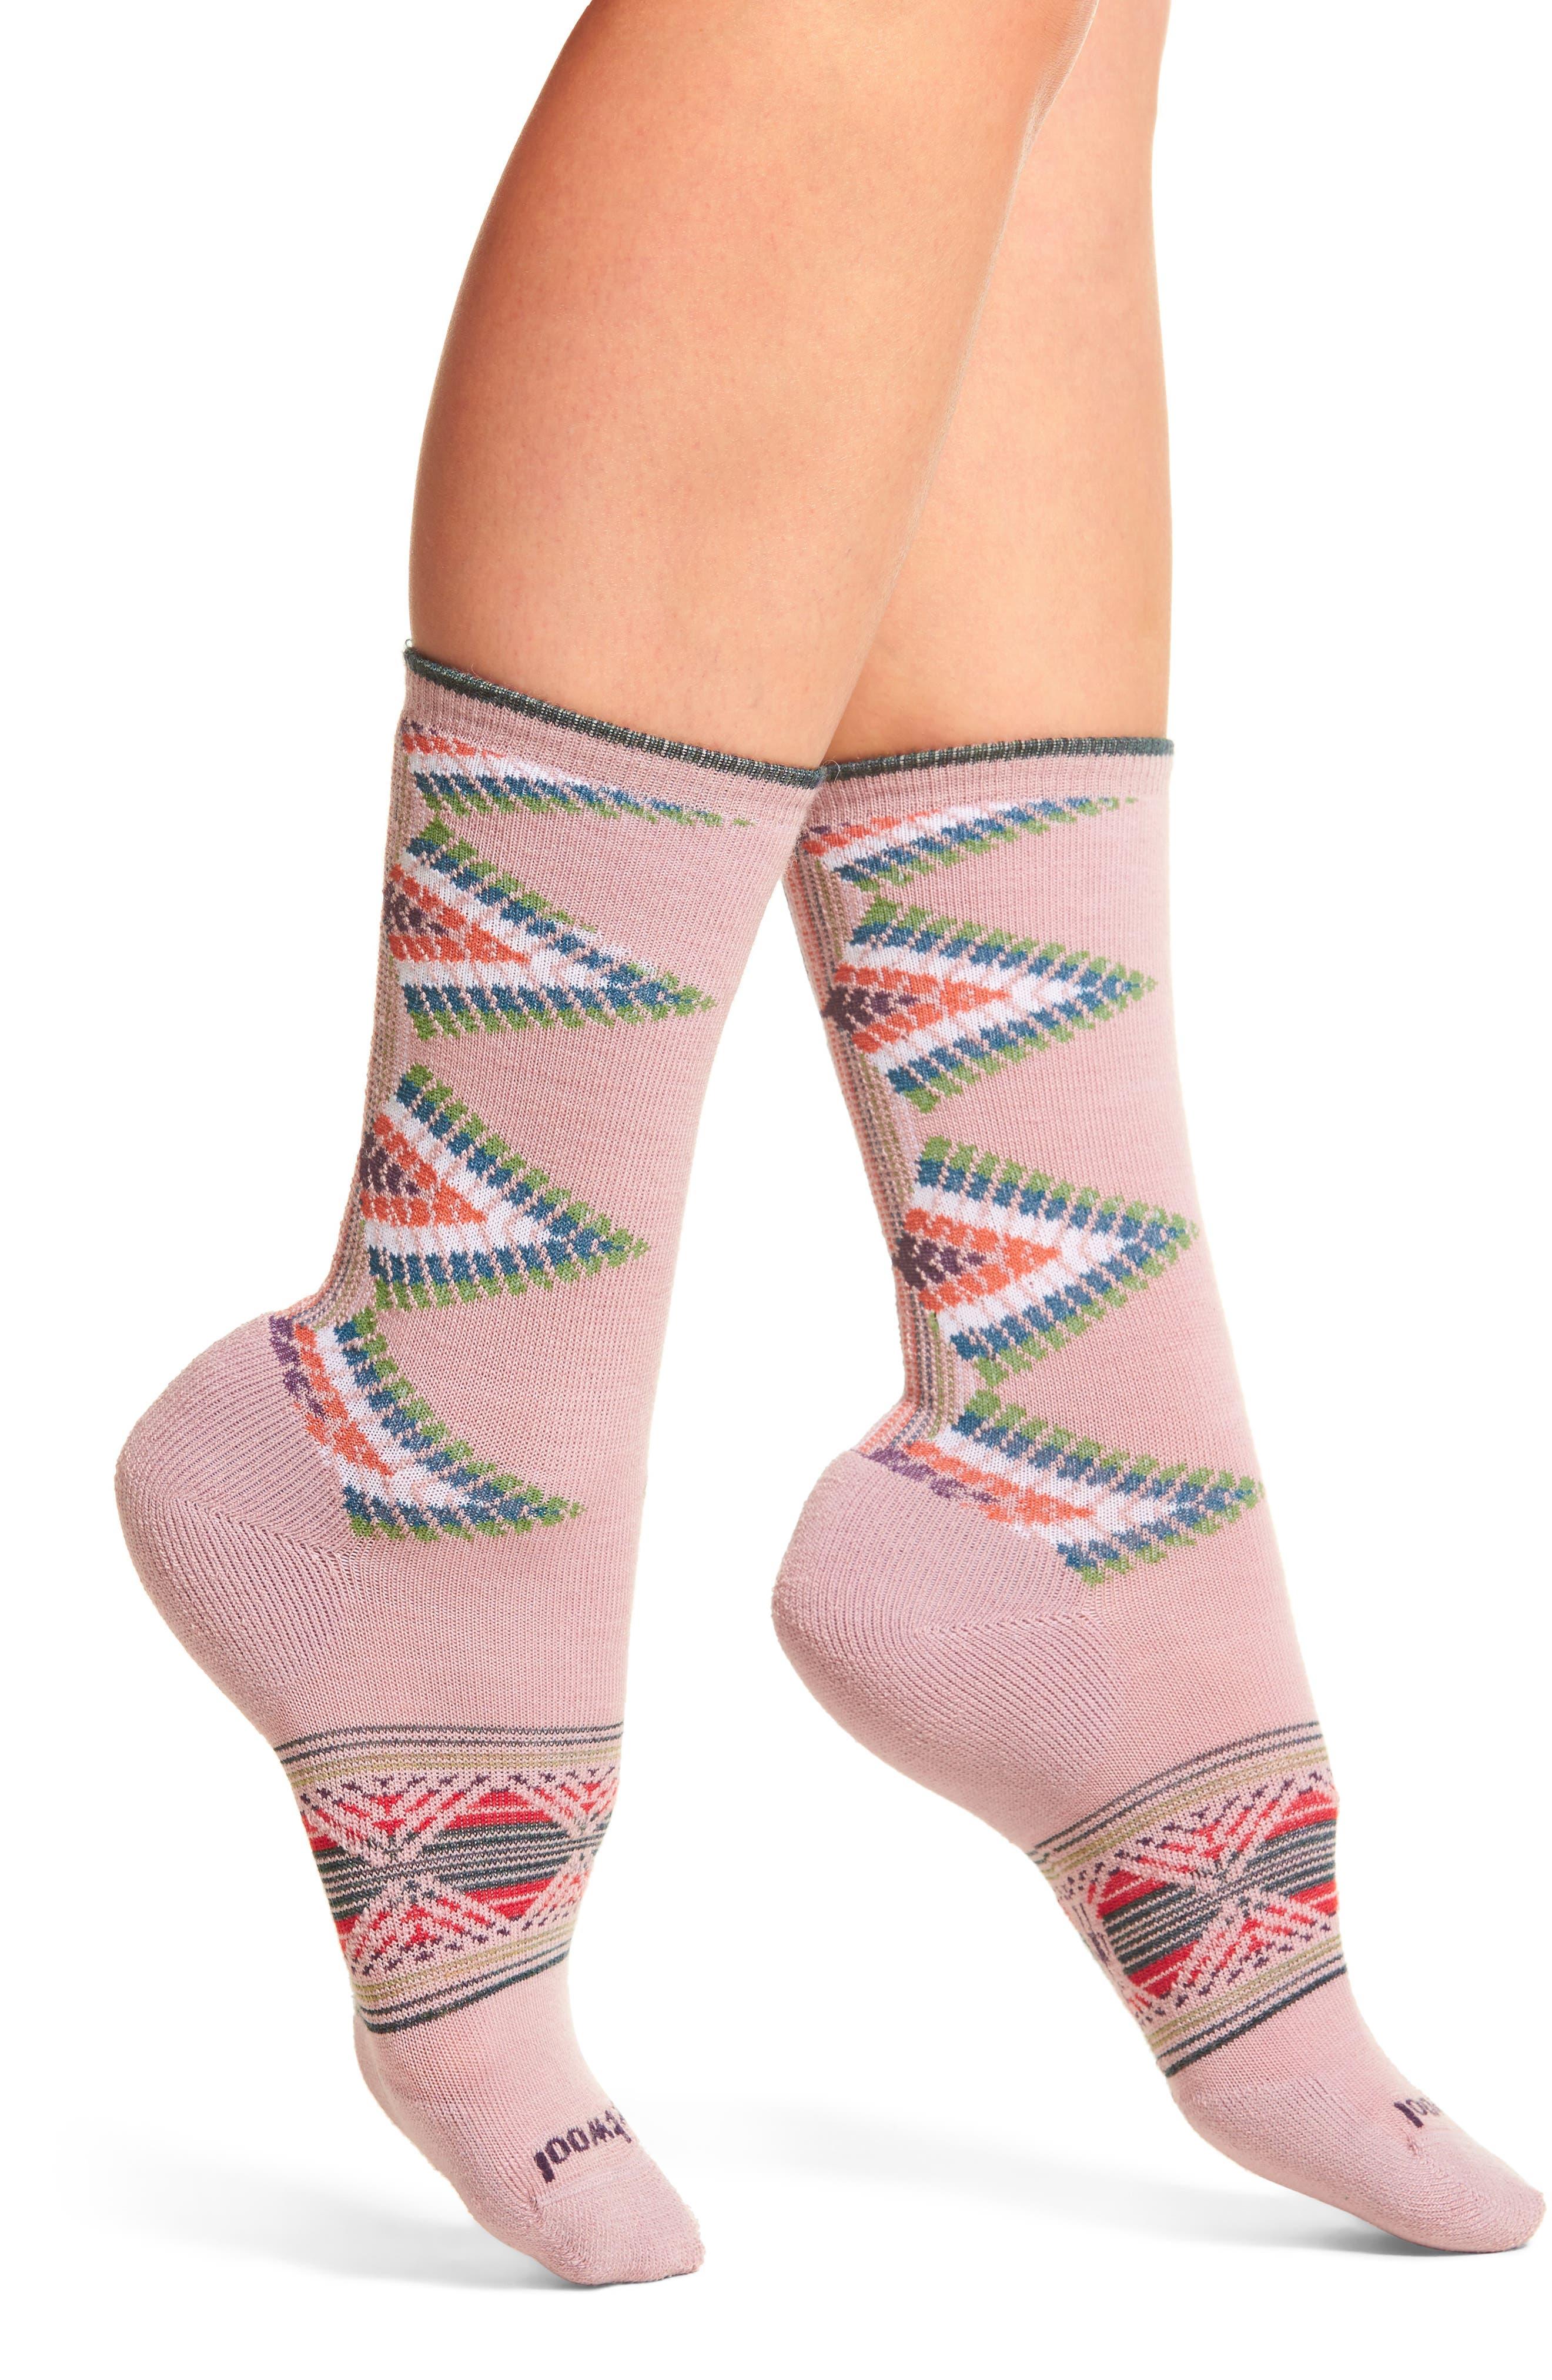 Tiva Crew Socks,                         Main,                         color, Woodrose Heather